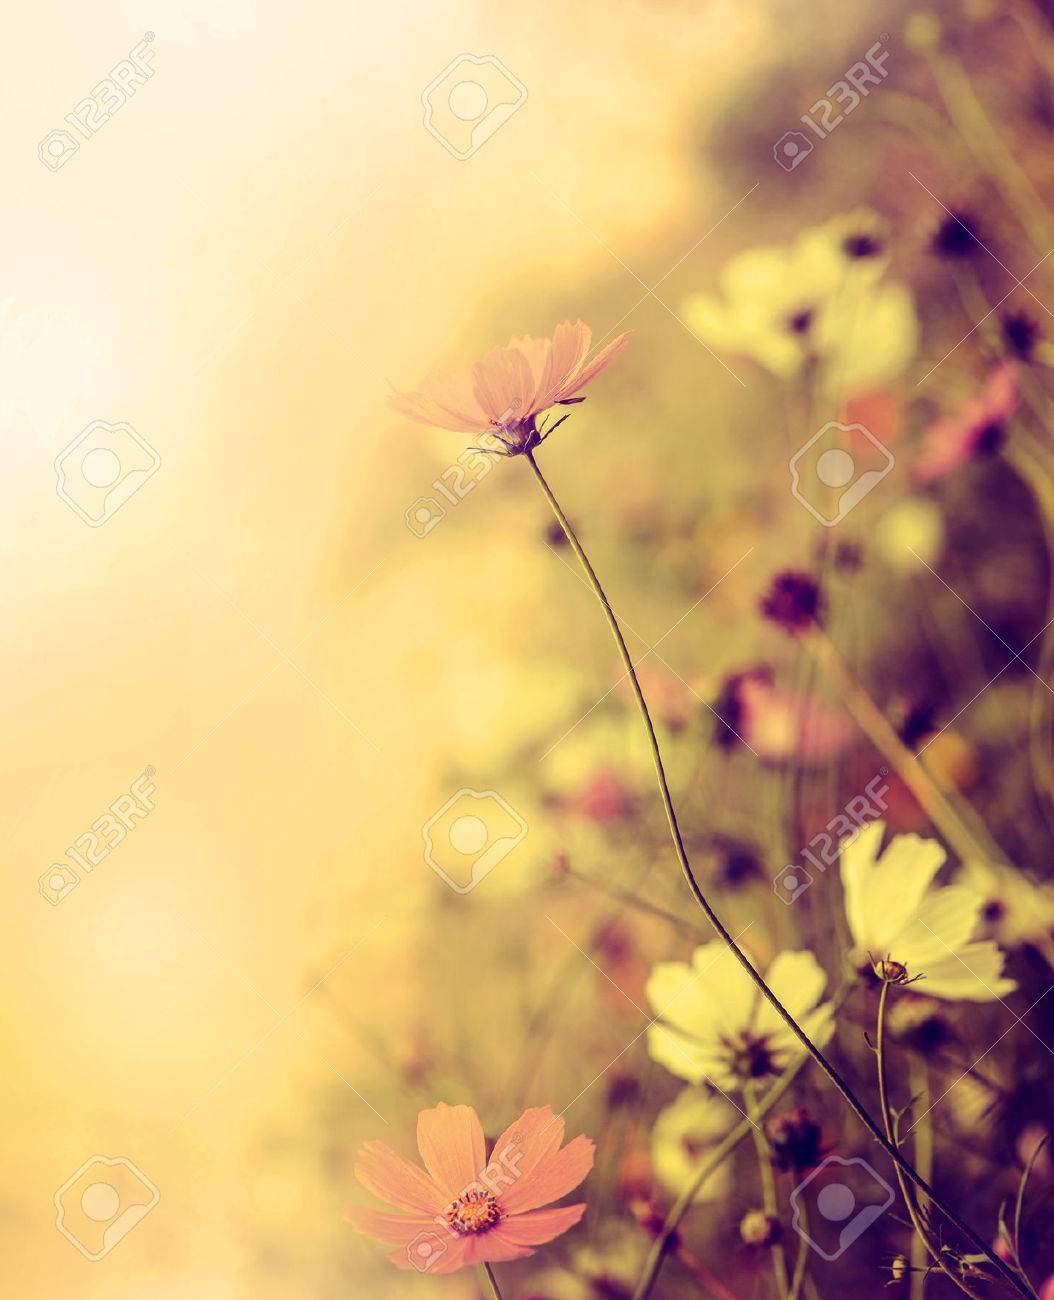 Beautiful defocus blur retro background with tender flowers. Floral art design in retro style Stock Photo - 22626825